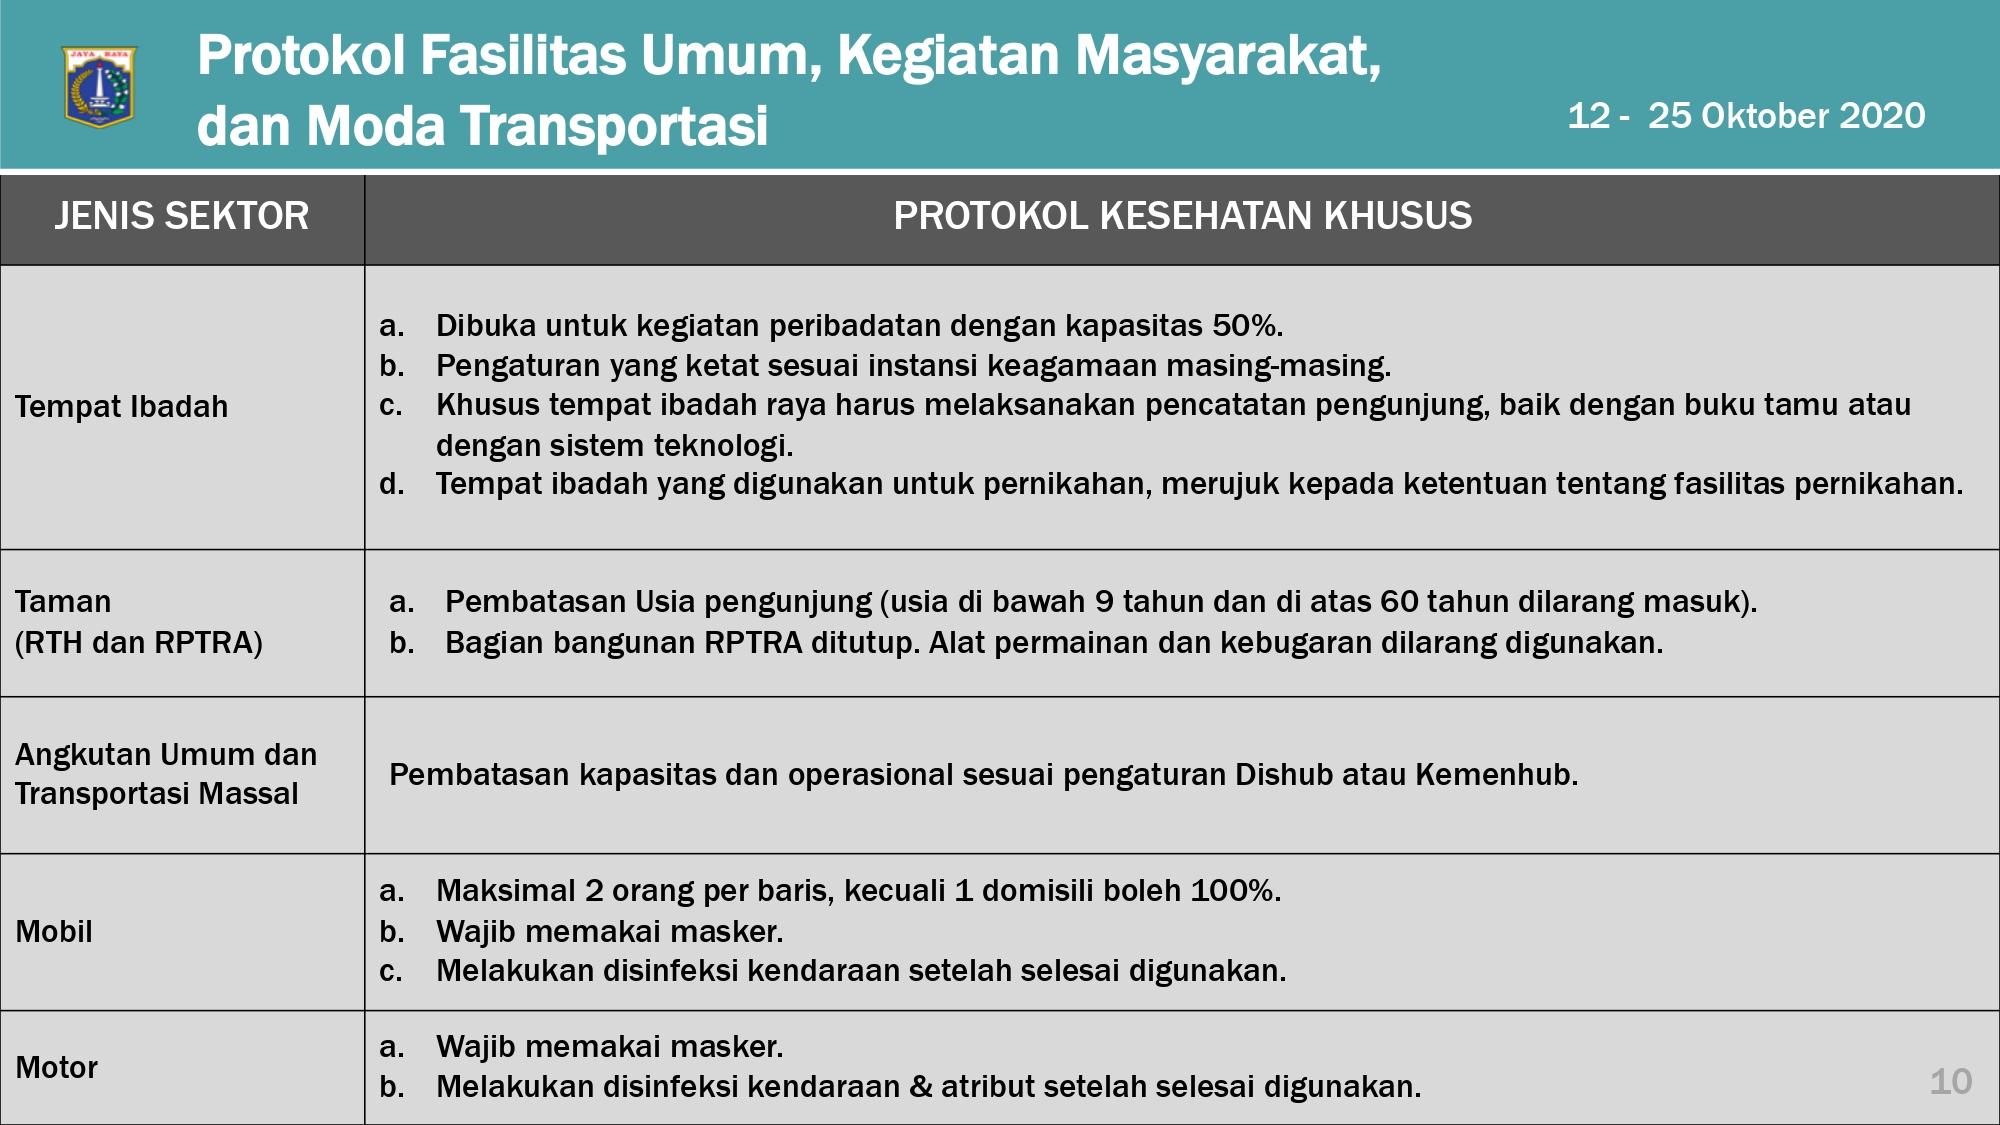 Pengaturan PSBB Transisi DKI Jakarta 12-25 Oktober 2020_page-0010